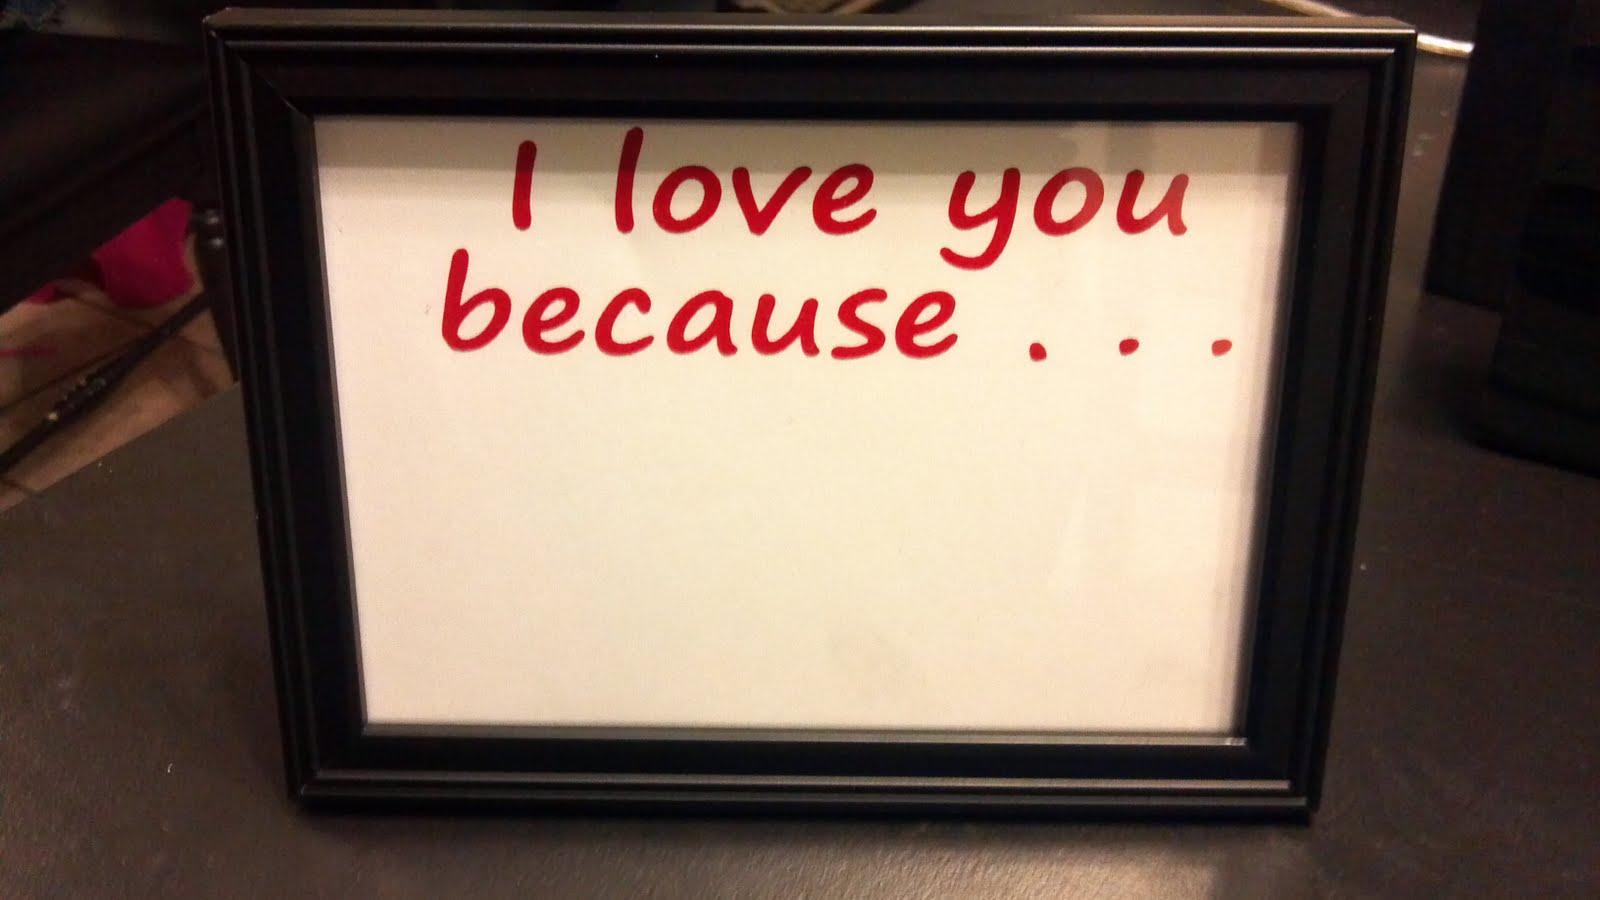 i love you frames - photo #24